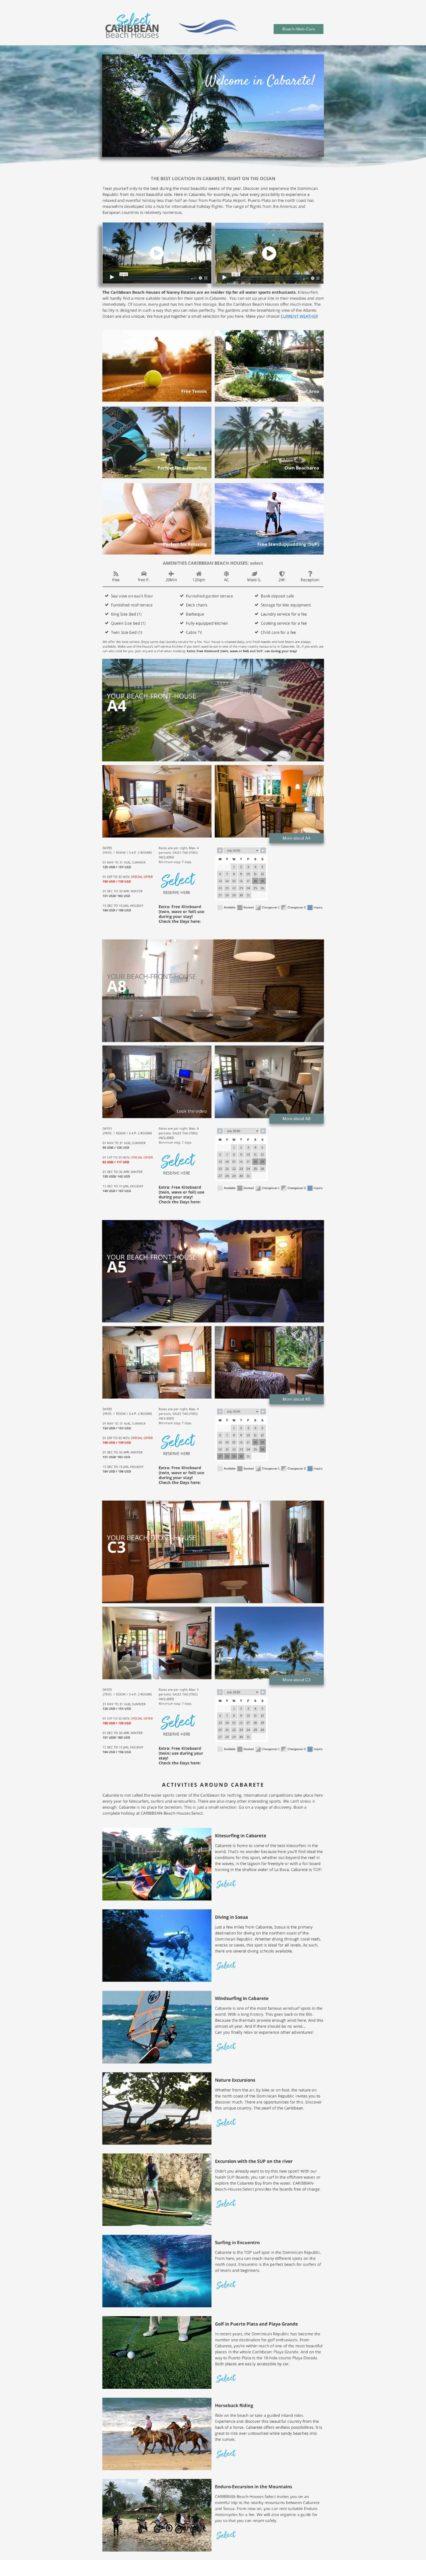 Cabarete Holiday - die beste Location in Cabarete